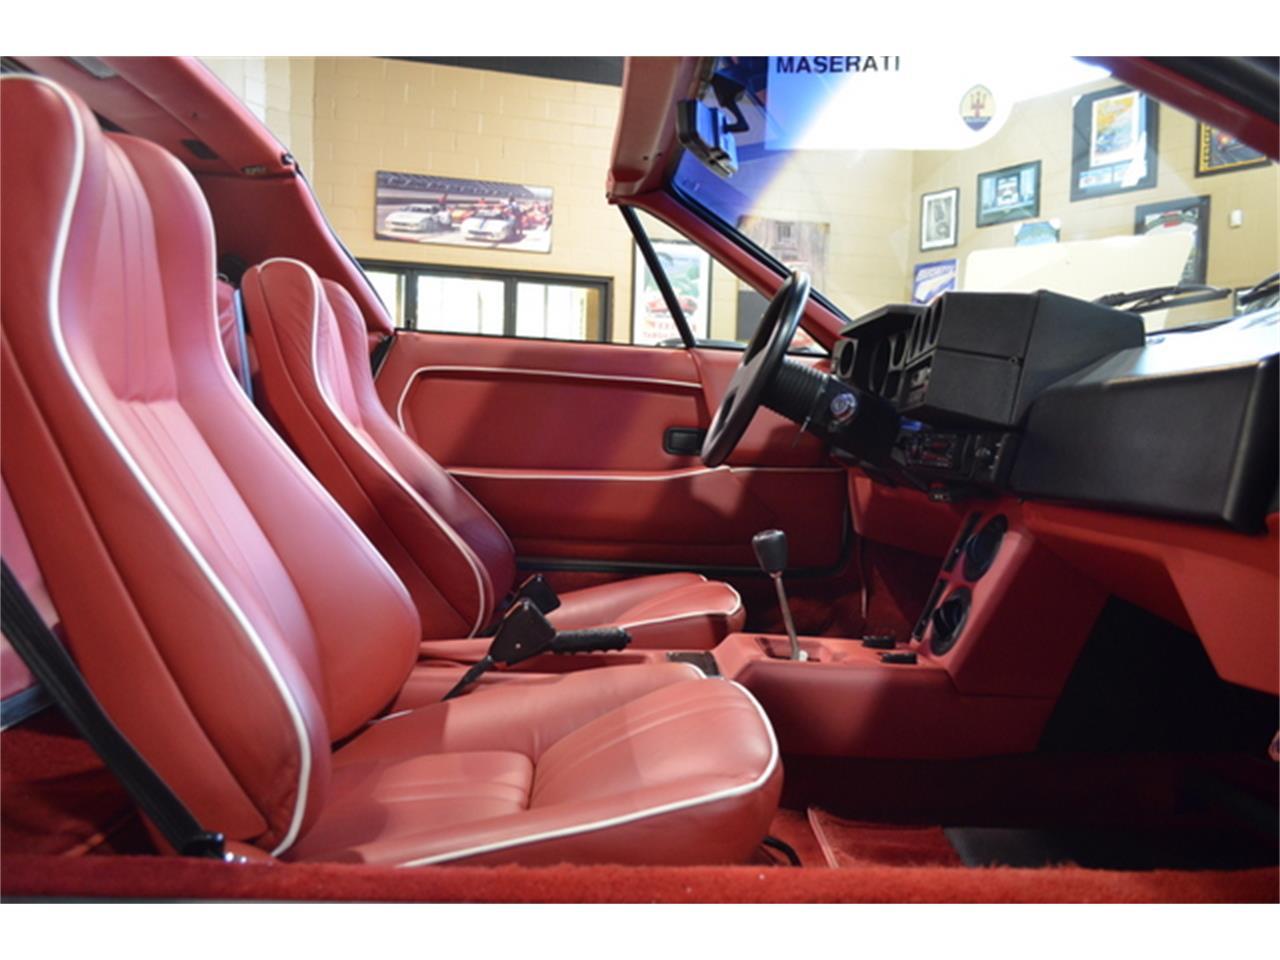 Large Picture of 1987 Lamborghini Jalpa located in Huntington Station New York Auction Vehicle - M6IZ